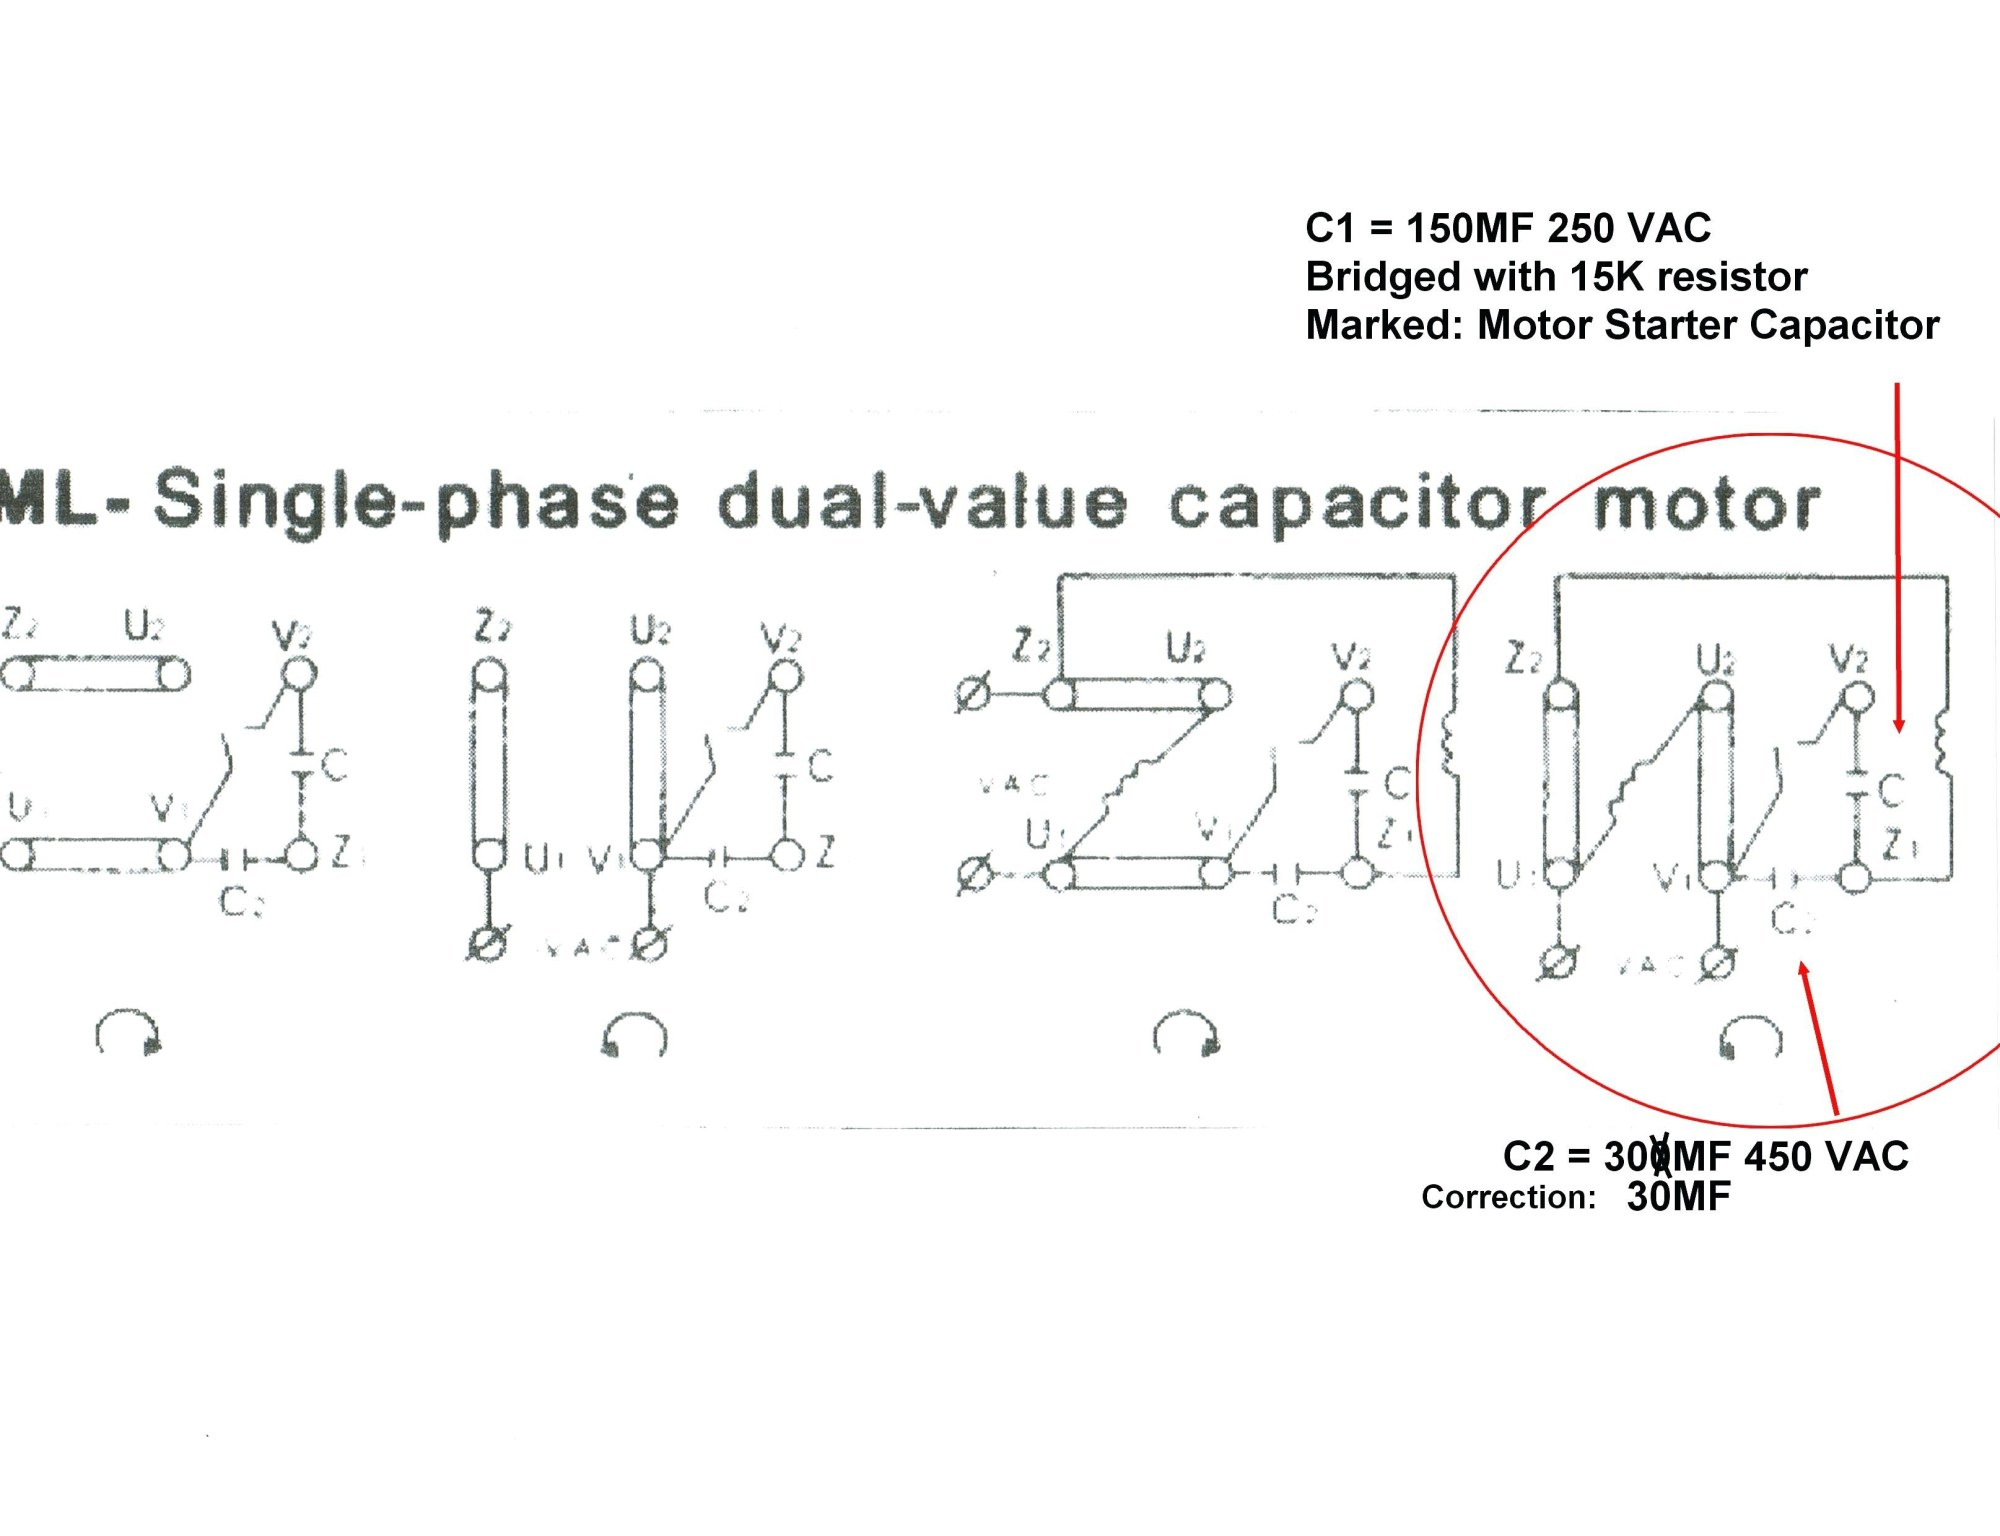 hight resolution of teco westinghouse motor wiring diagram teco westinghouse motor wiring diagram download westinghouse motor starter wiring